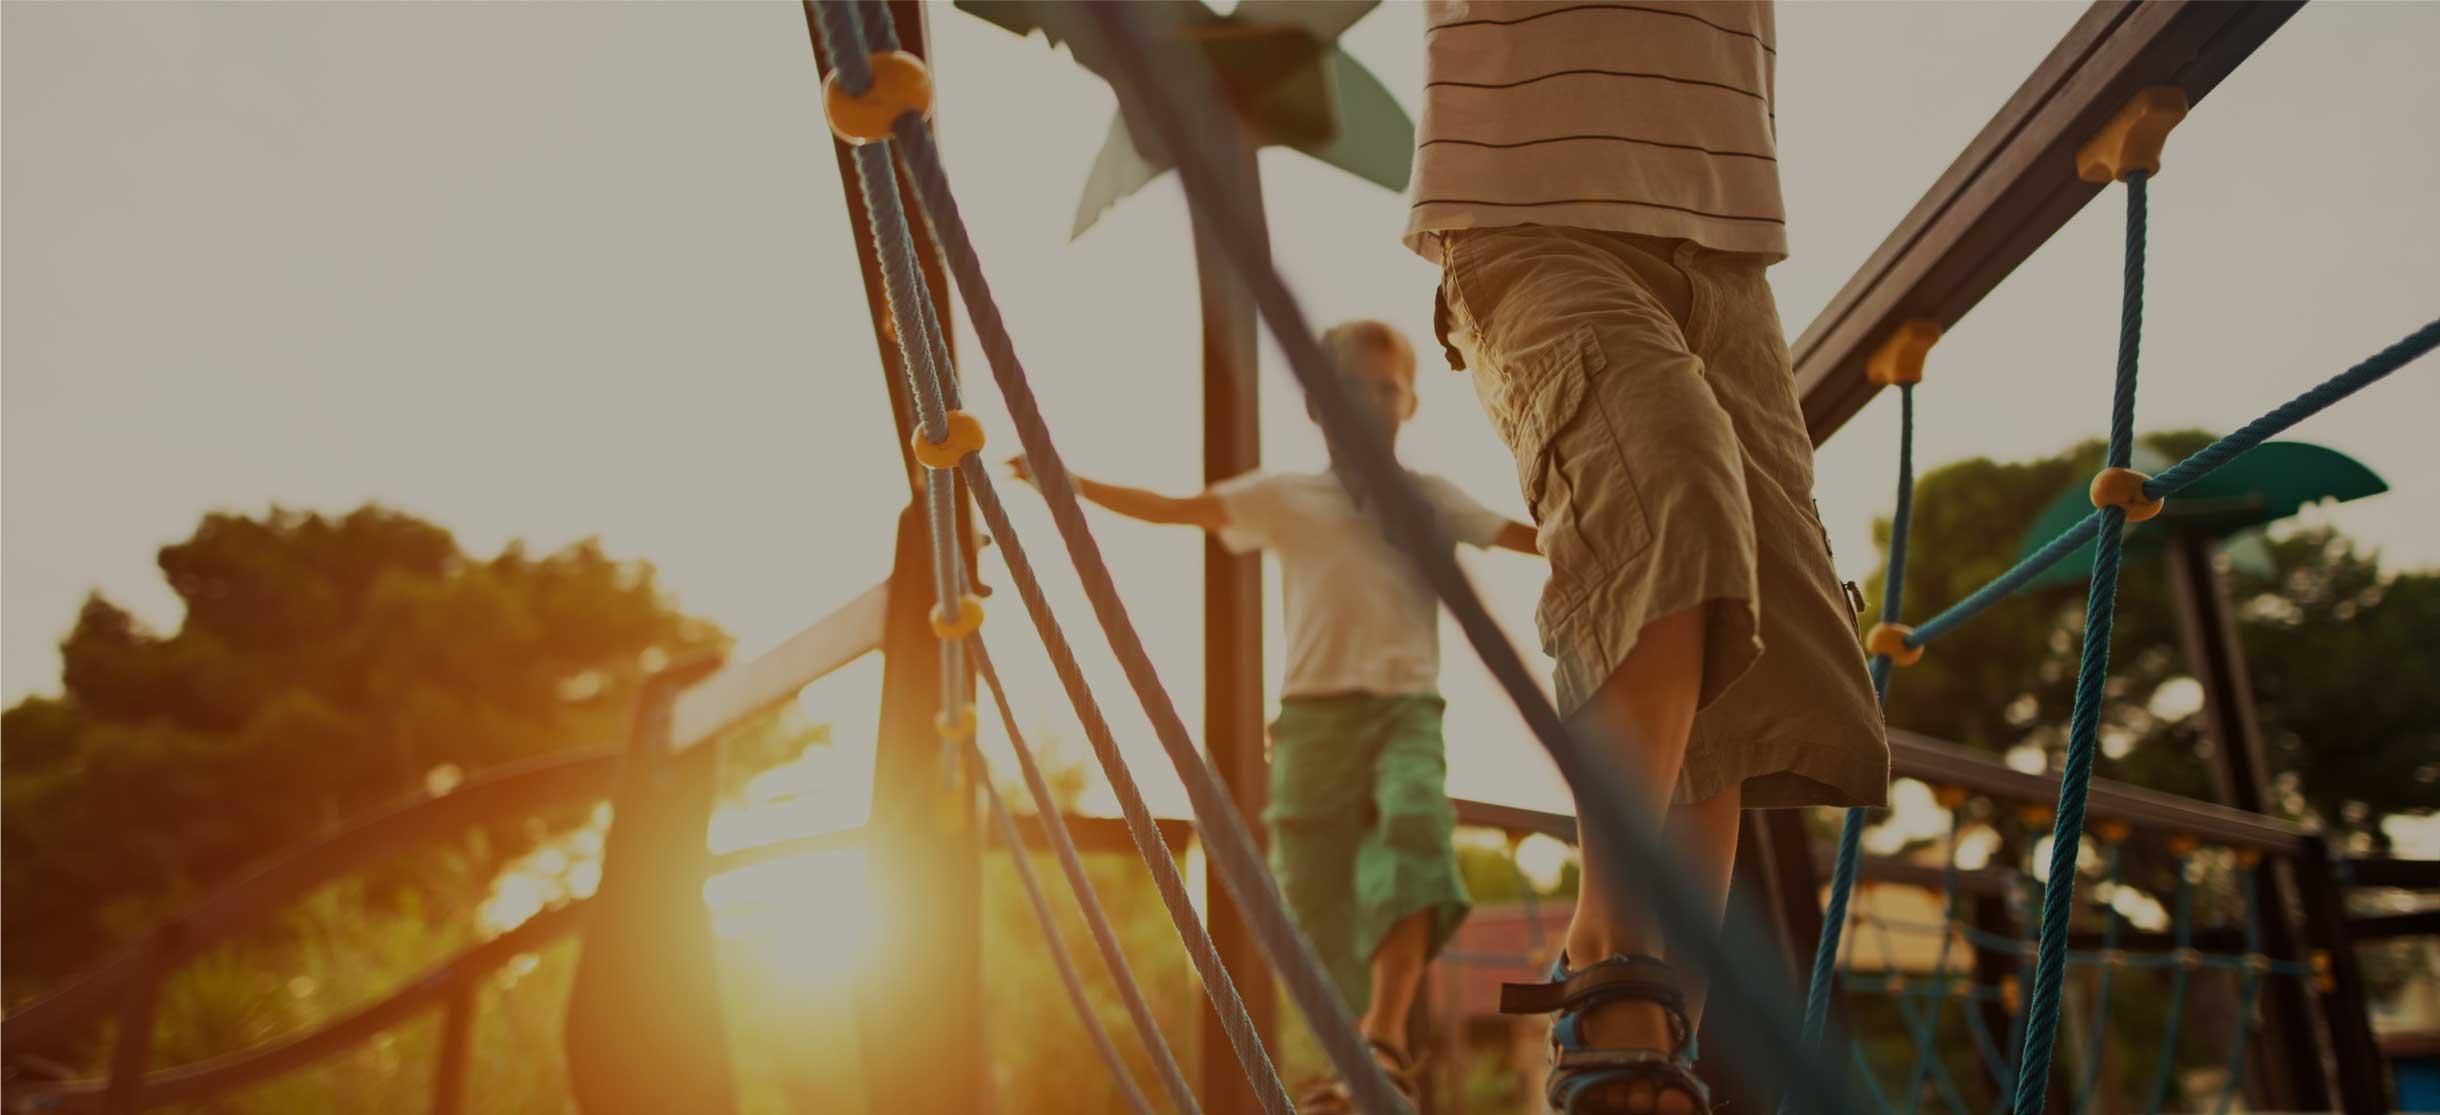 Header Equipements de Sports & loisirs d'extérieurs